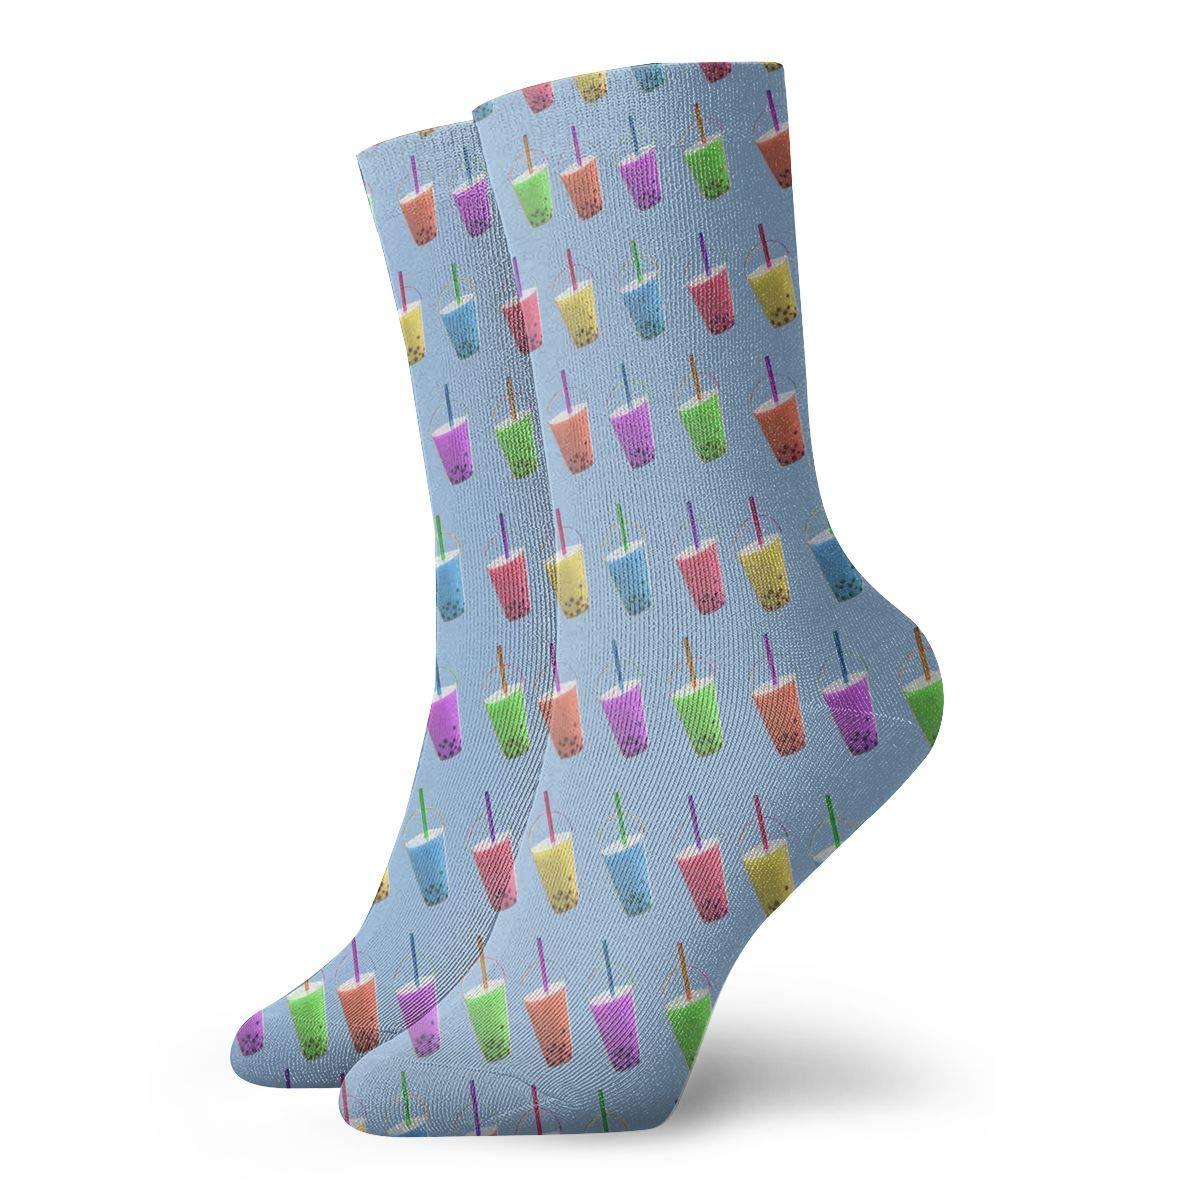 Sweet Bubble Tea Colorful Unisex Funny Casual Crew Socks Athletic Socks For Boys Girls Kids Teenagers